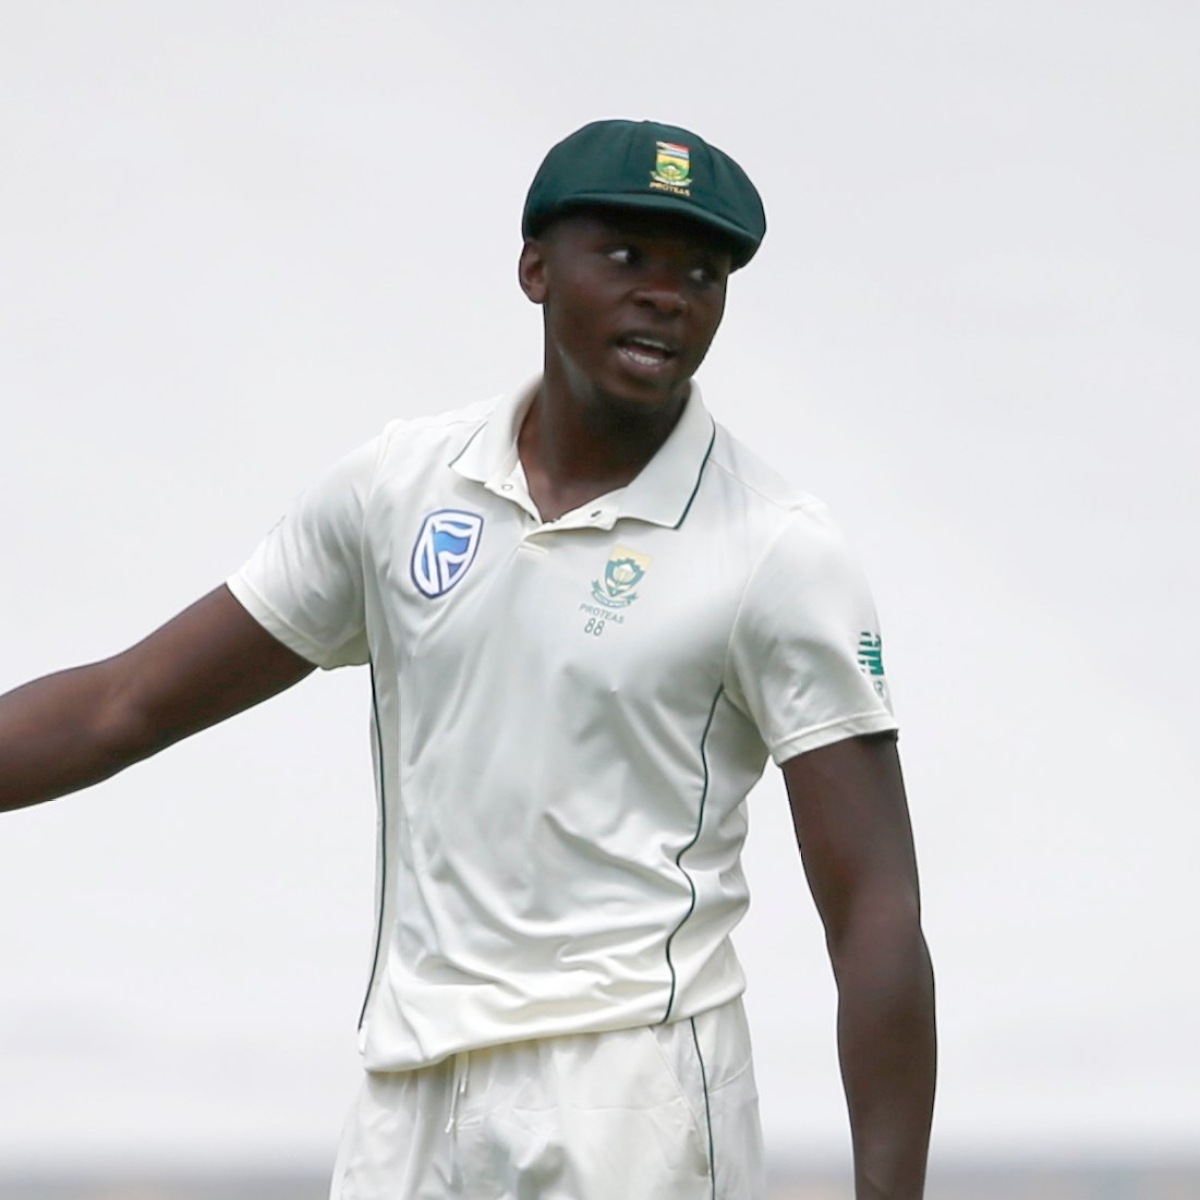 Pak vs SA, 1st Test: Bowlers bring Proteas back in the game after batsmen falter